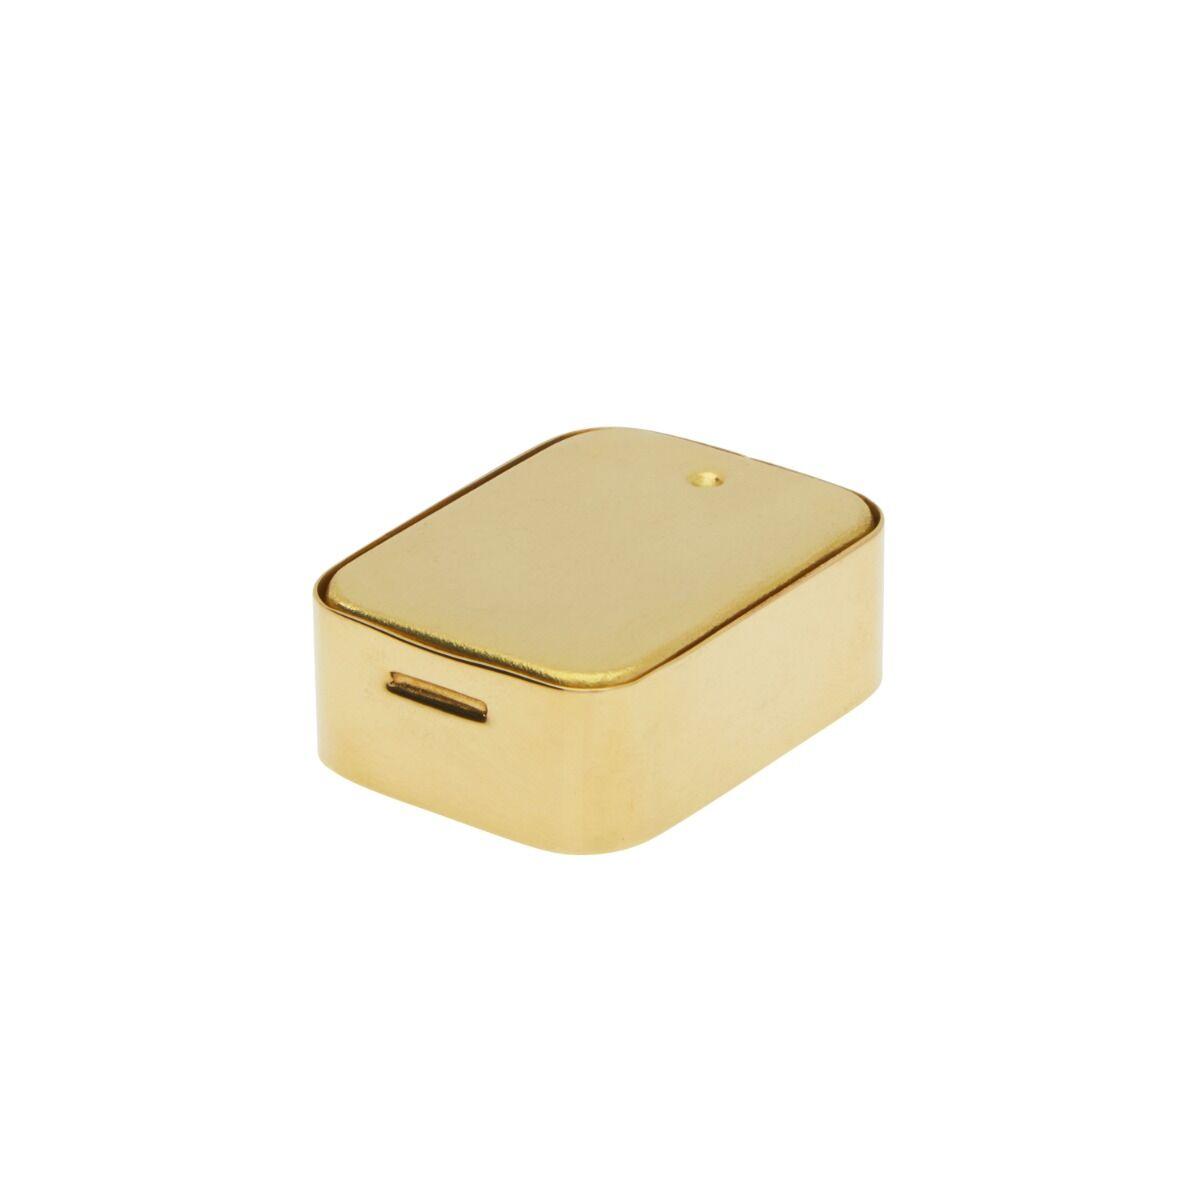 Very Shiny Brass Bin image